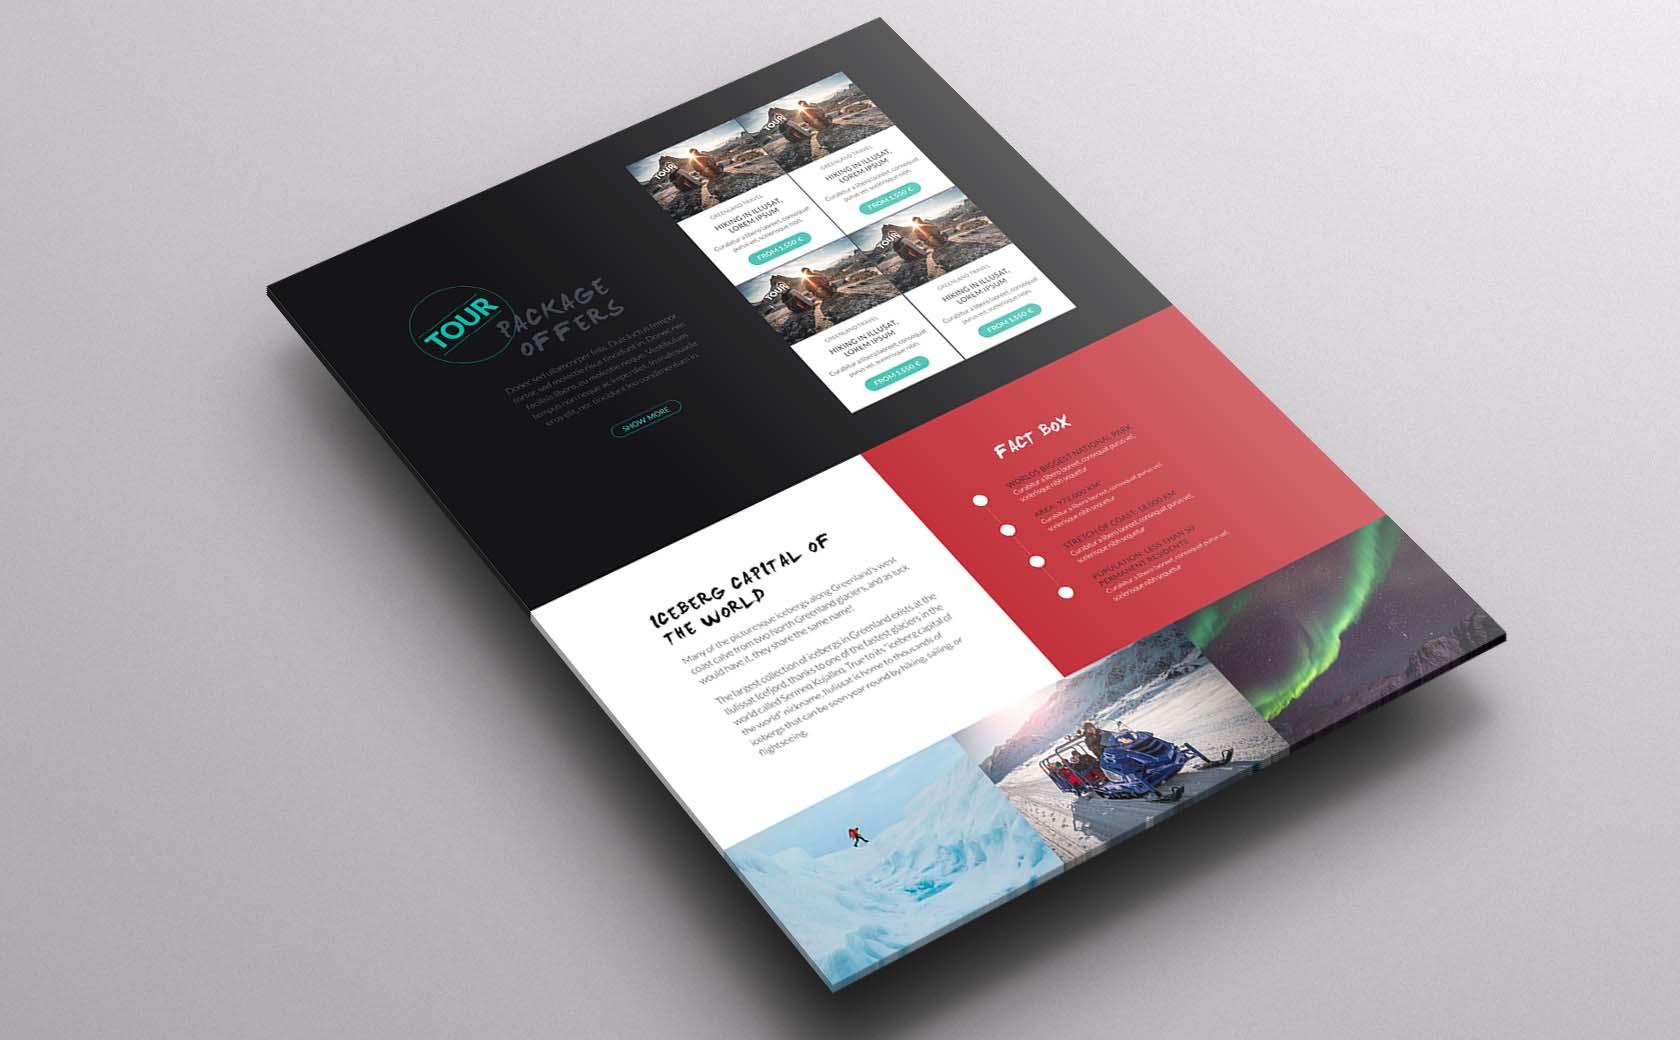 Visitgreenland_iPad-flow_D.jpg